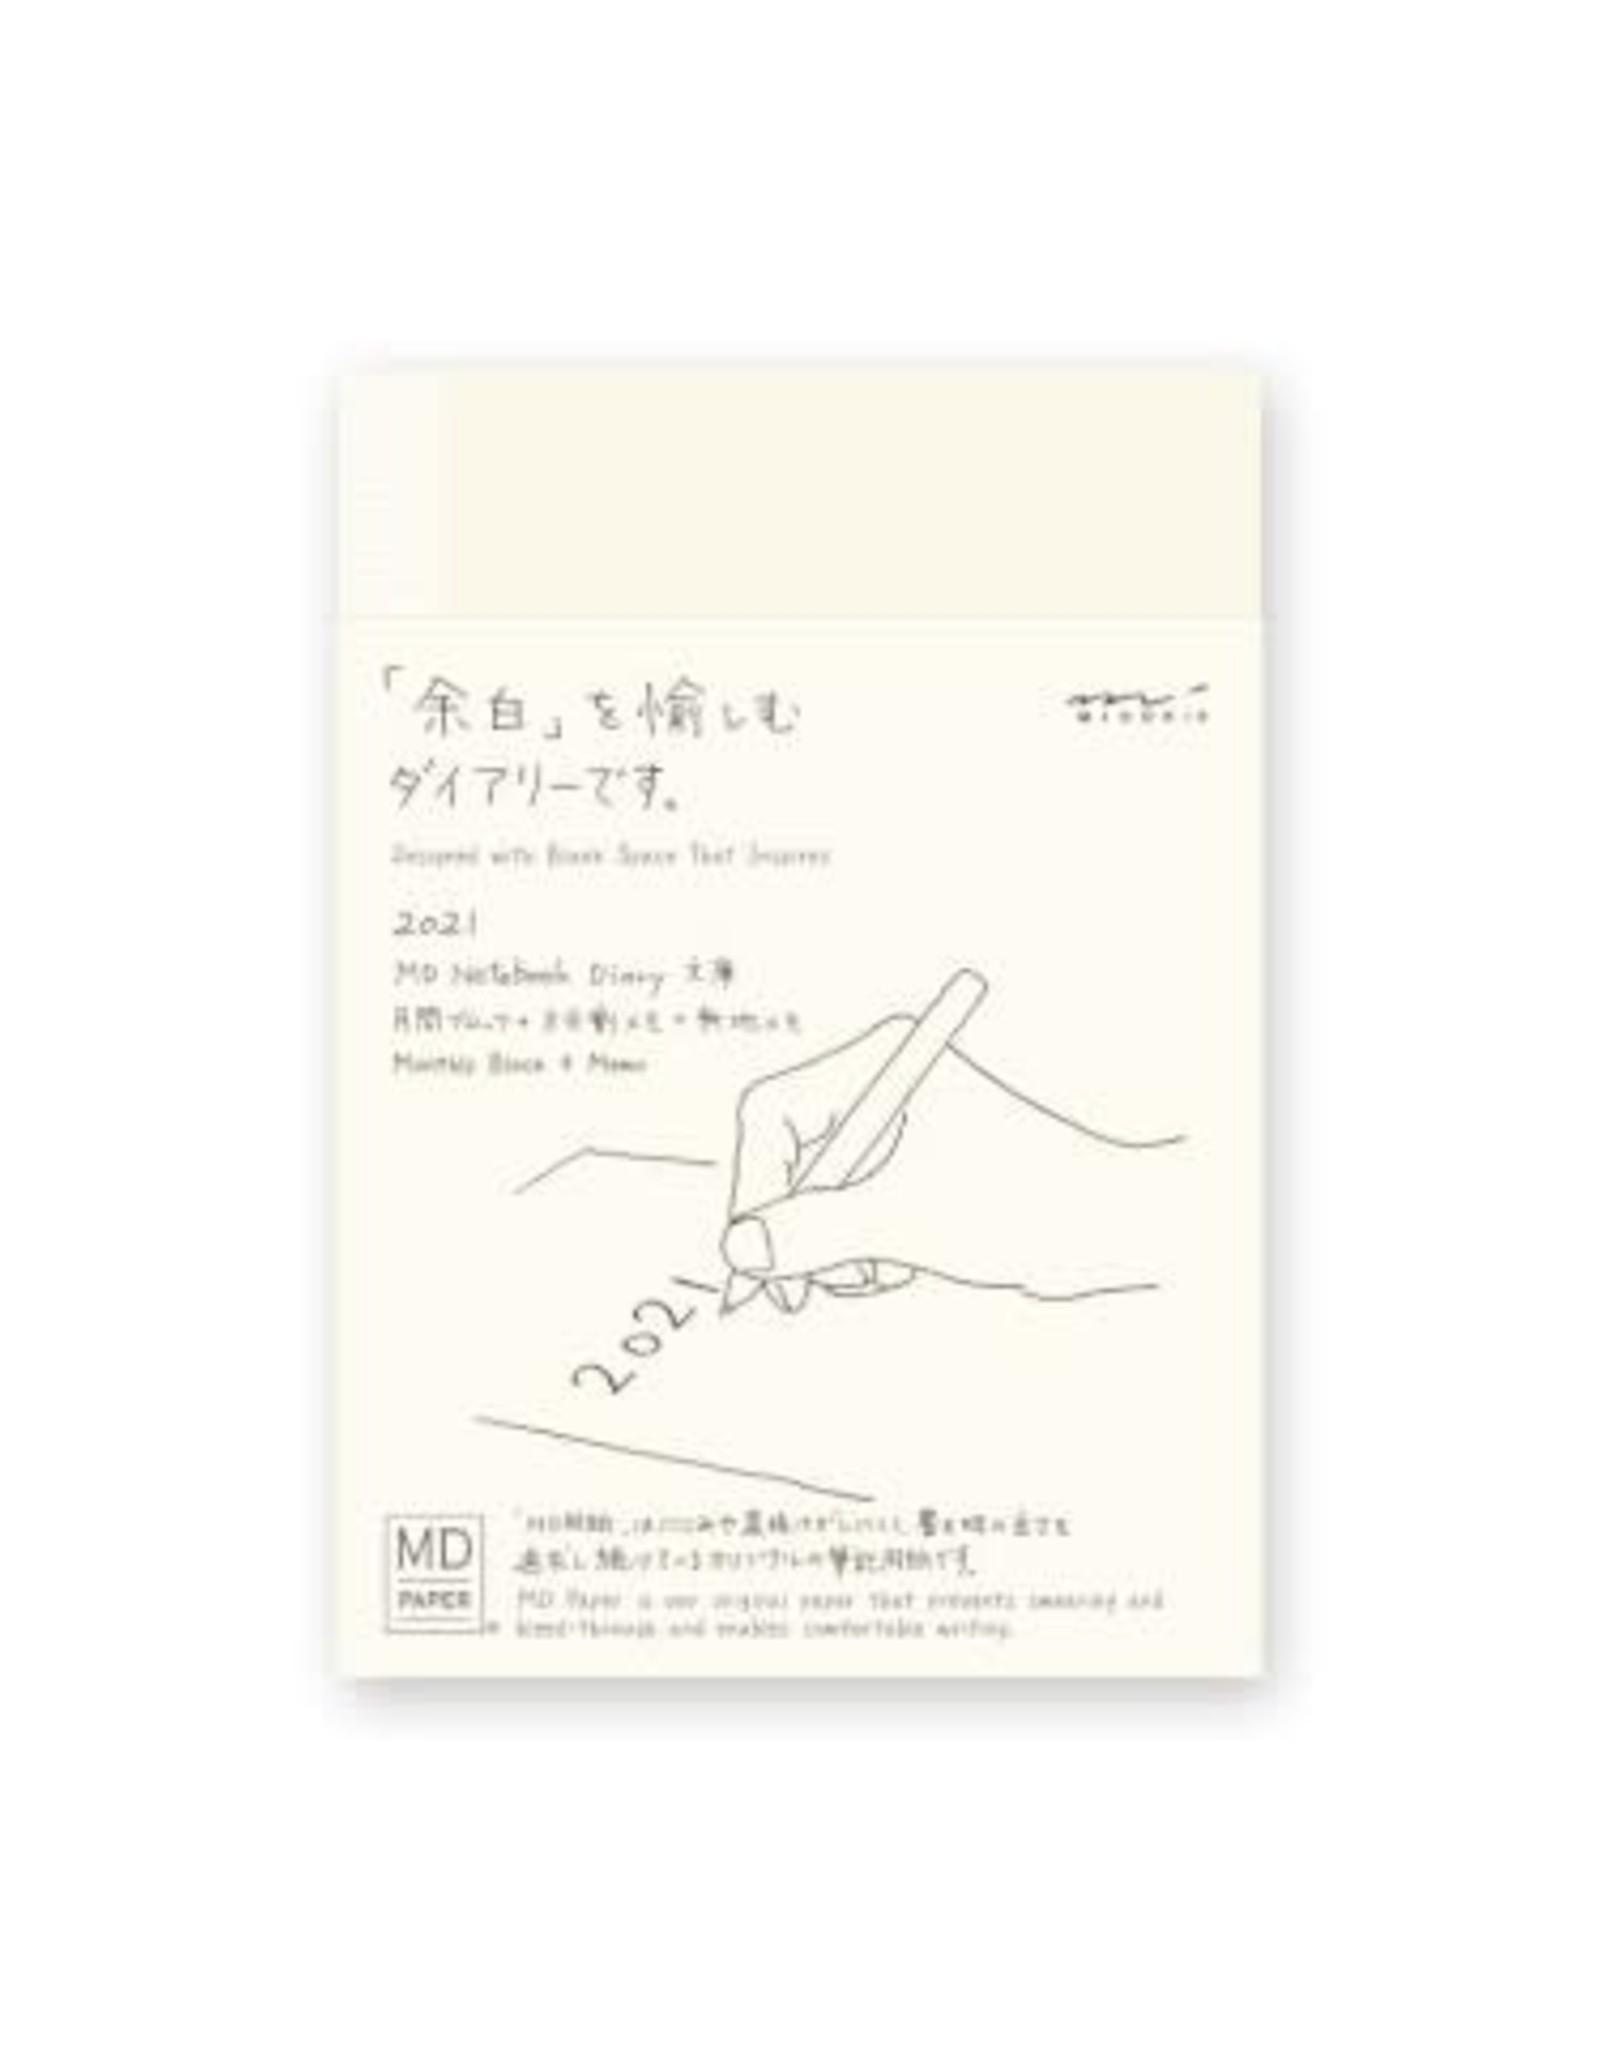 Midori MD Notebook Diary 2022